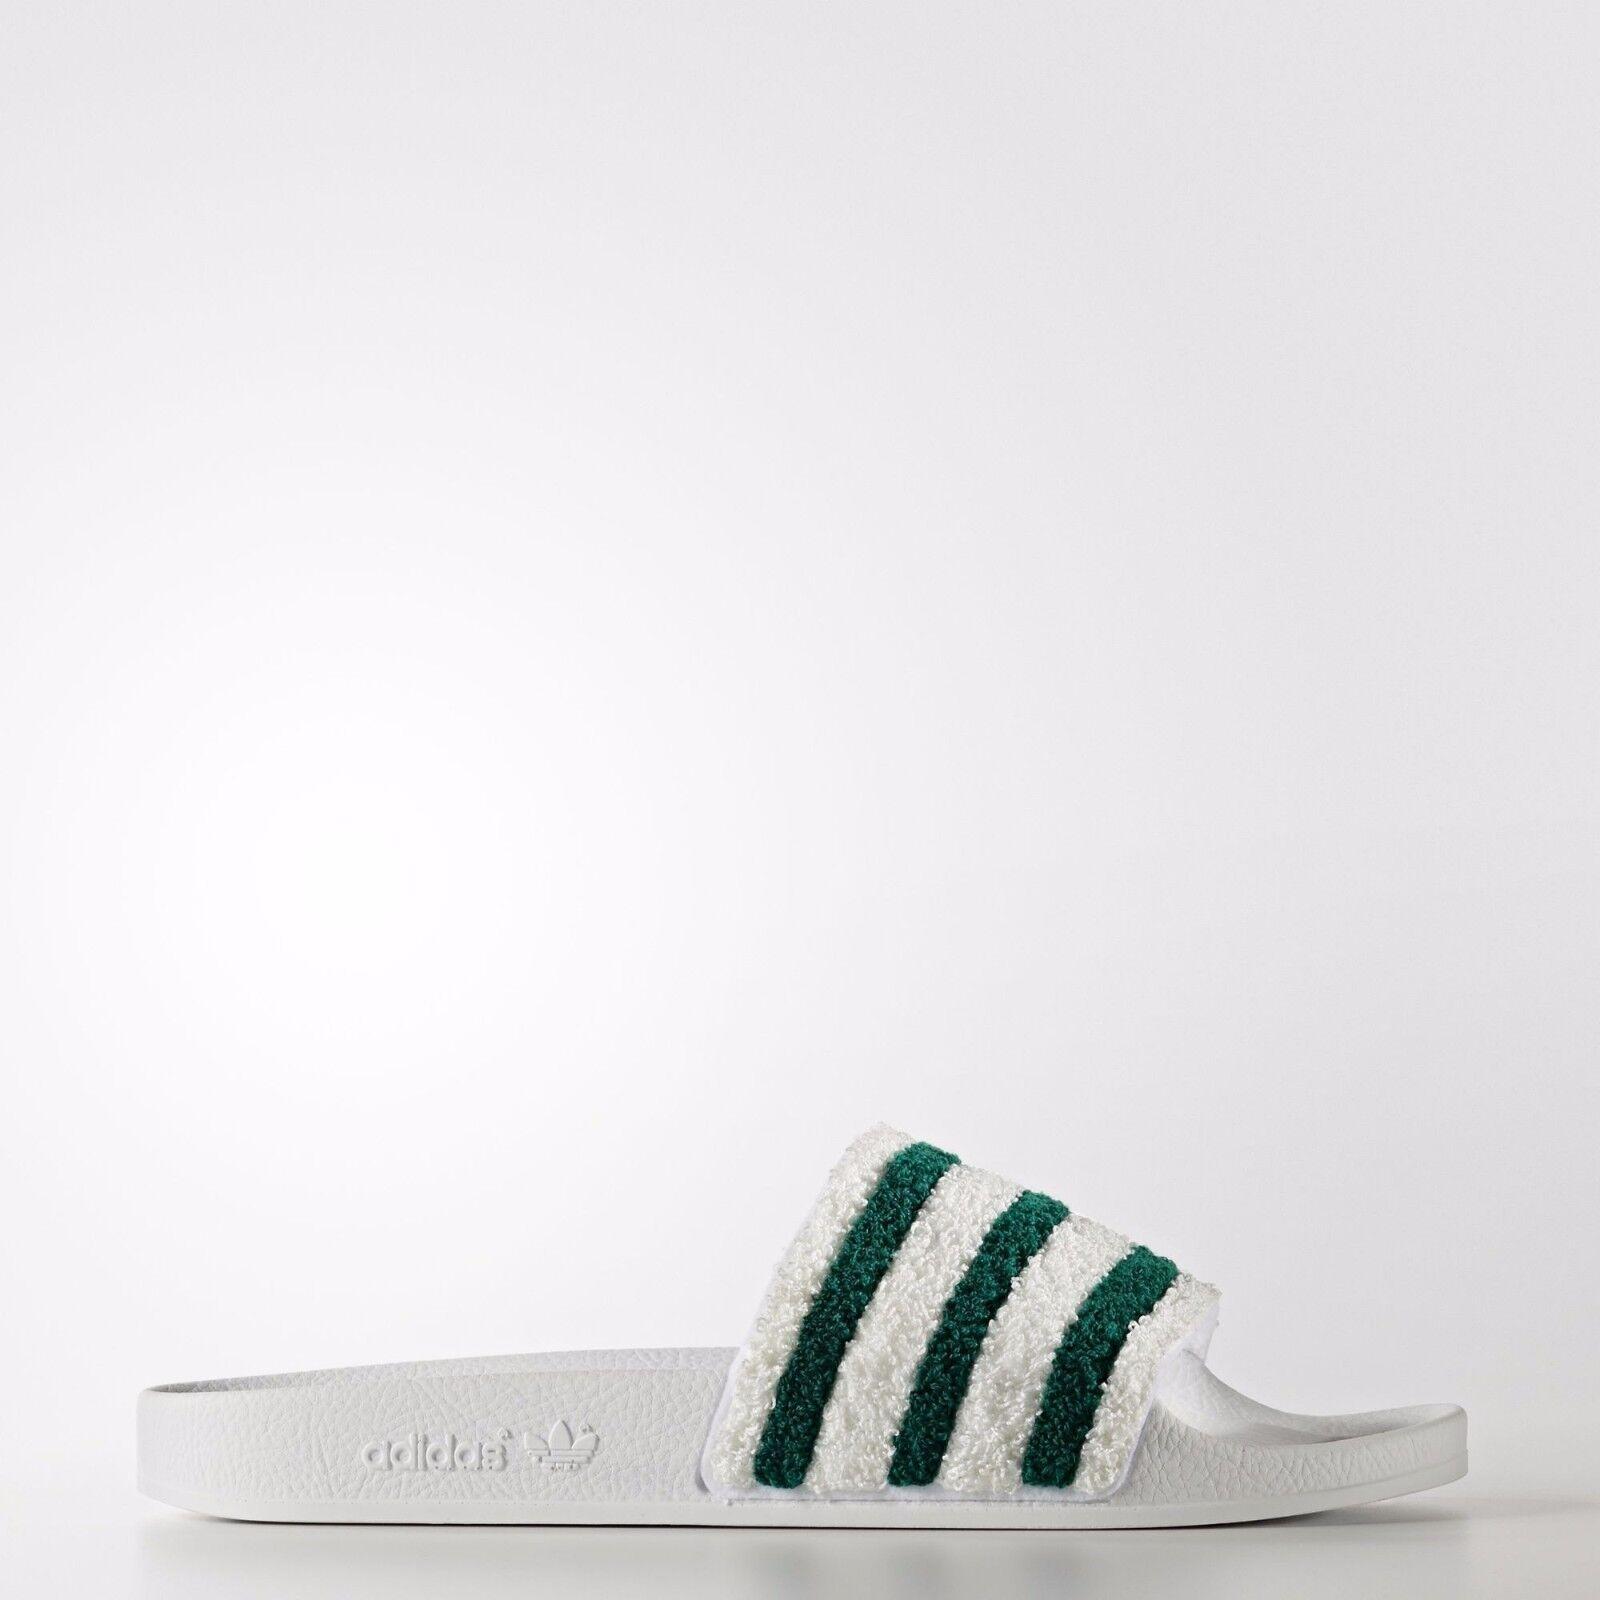 7ba5e15dec20 ... White Green BB0124 b b b 37290f. Journals   Books · Register · Sign In  · Help. Nike Ultra Celso Thong Mens 882691-401 Midnight Navy White Sandals  ...